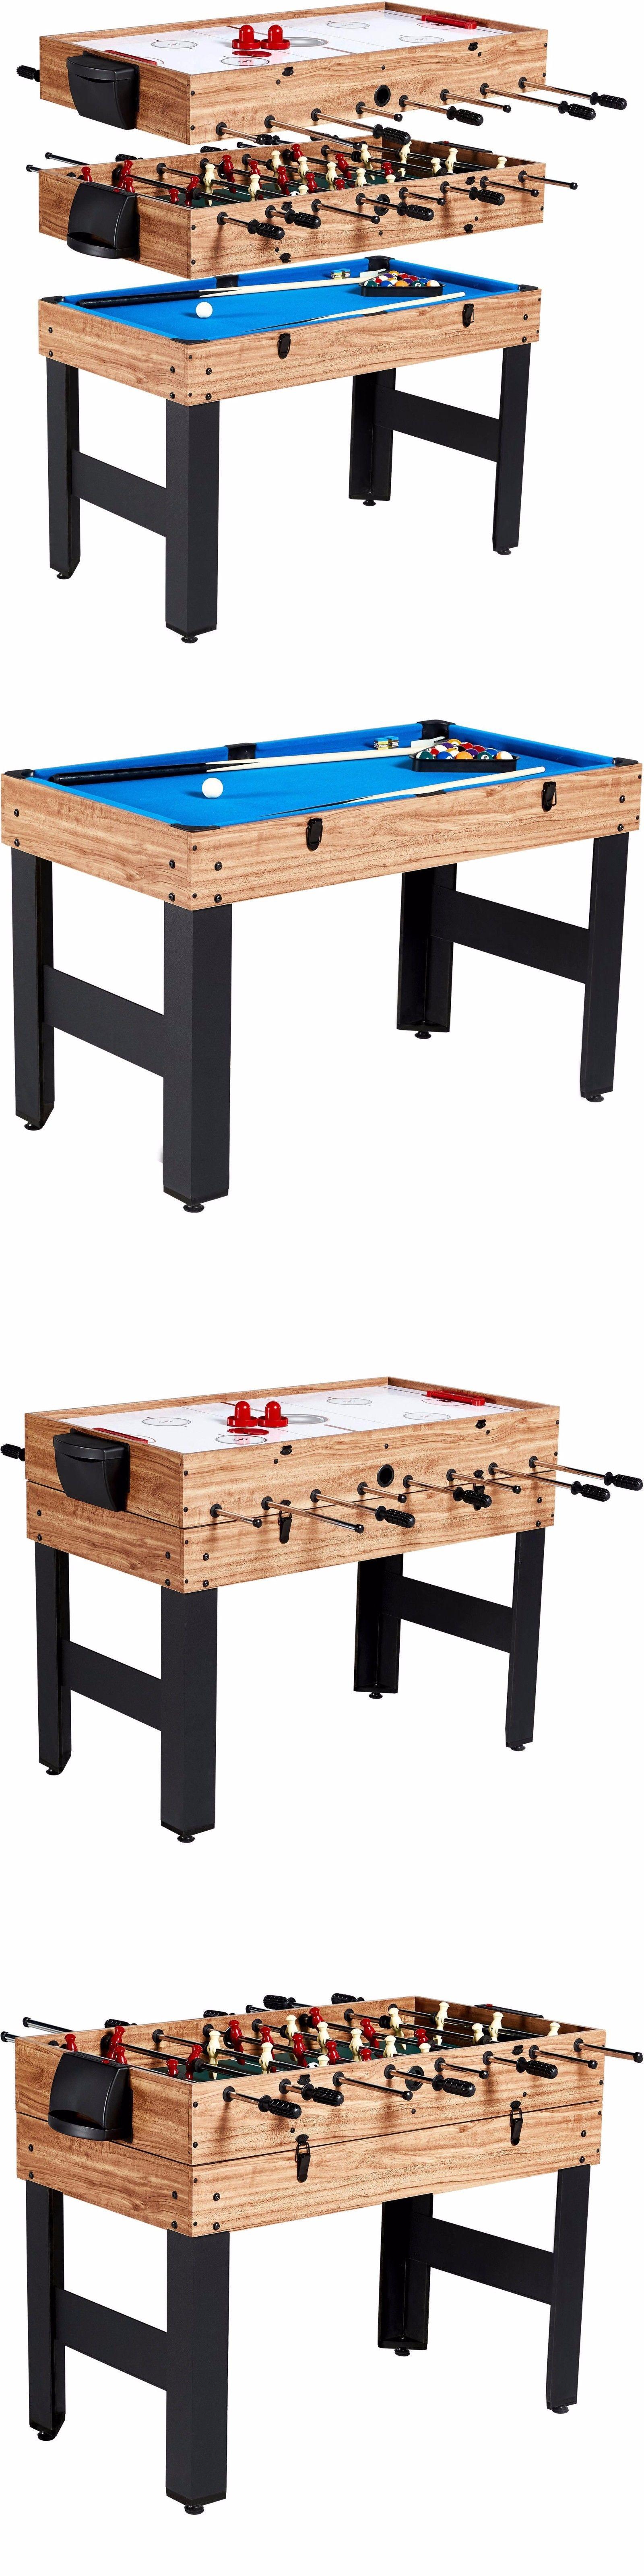 Tables 21213: Combo Game Table 3 In 1 Billiard Slide Hockey Soccer Sport  Multi Play